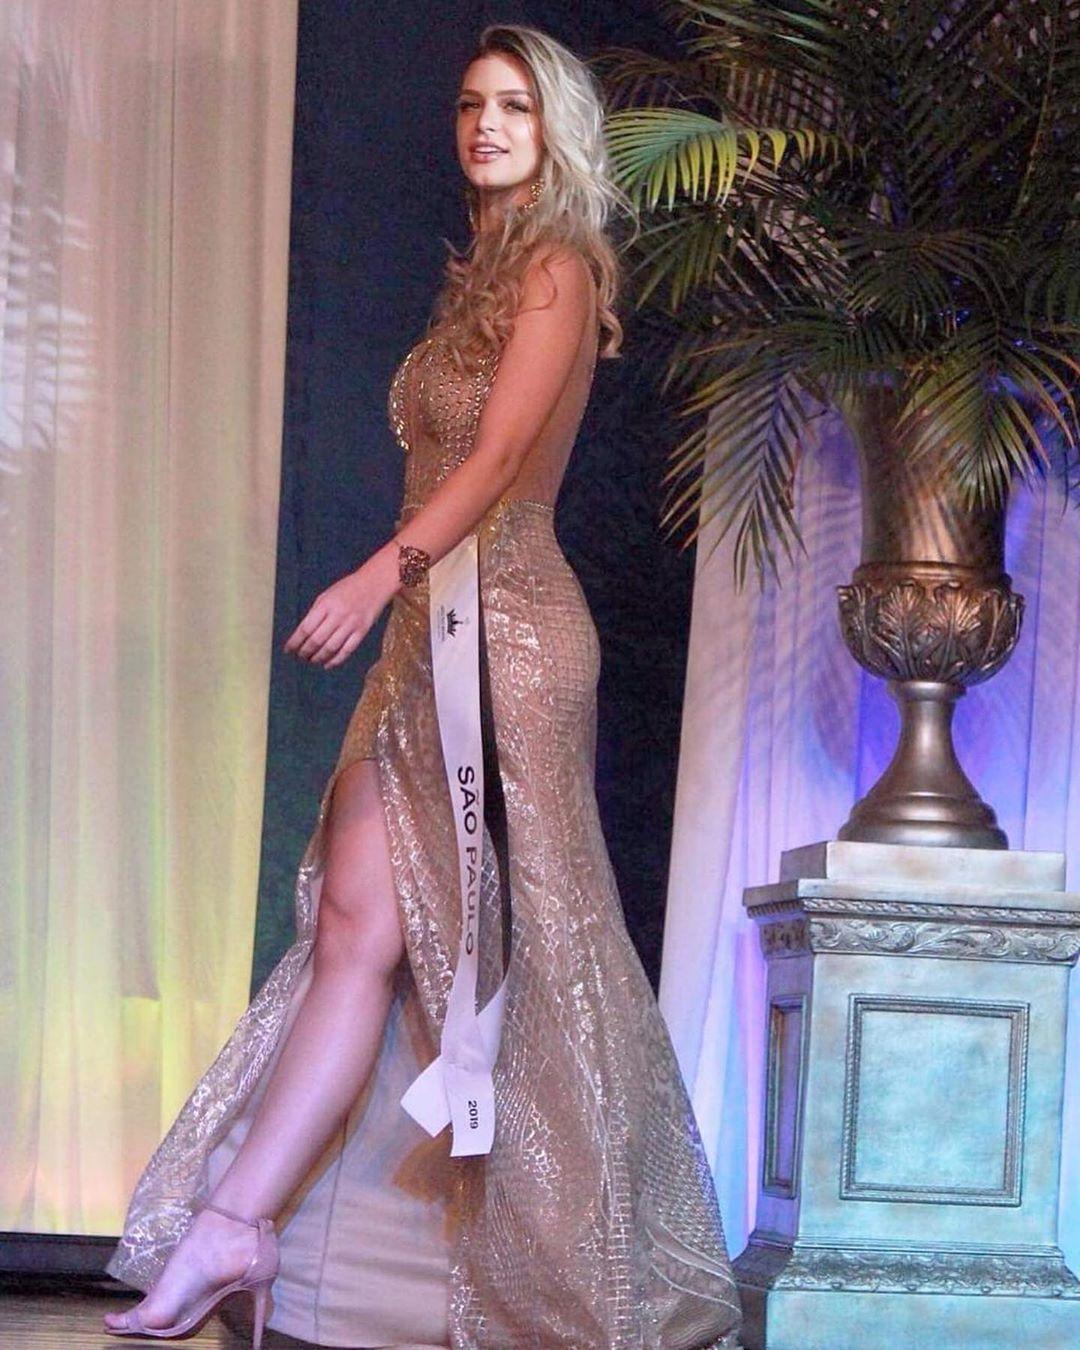 maria gabriela batistela, miss brasil terra 2019. - Página 4 60359610